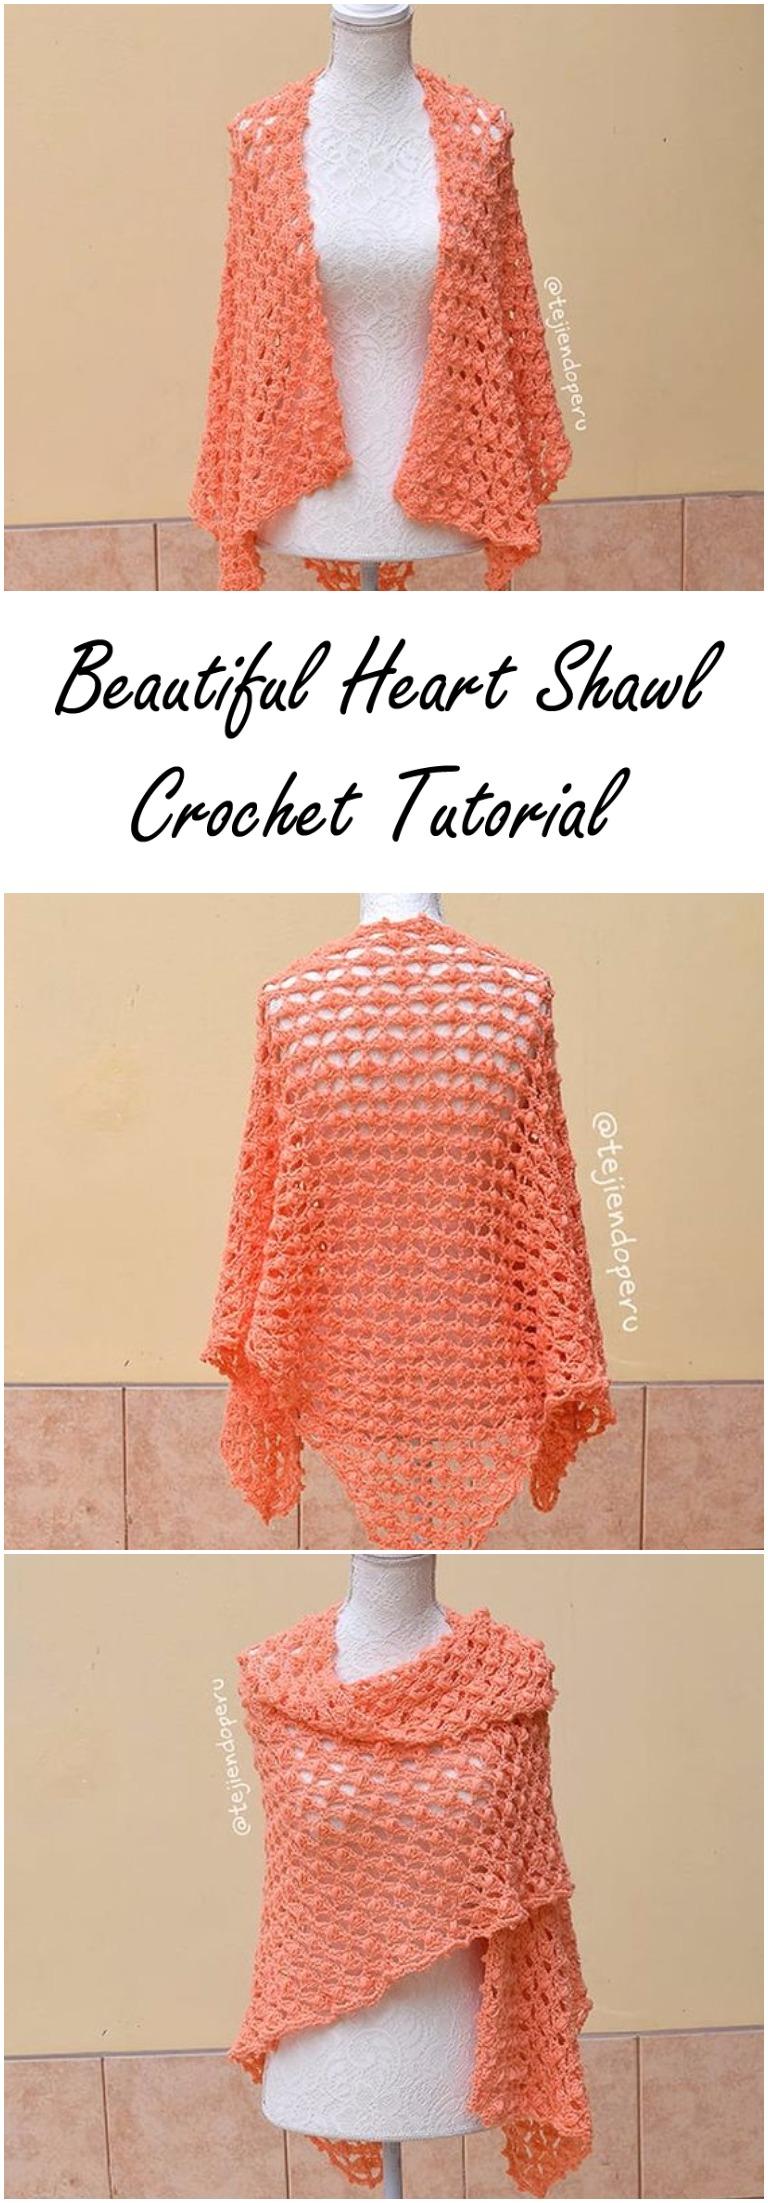 Beautiful Heart Shawl Crochet Tutorial